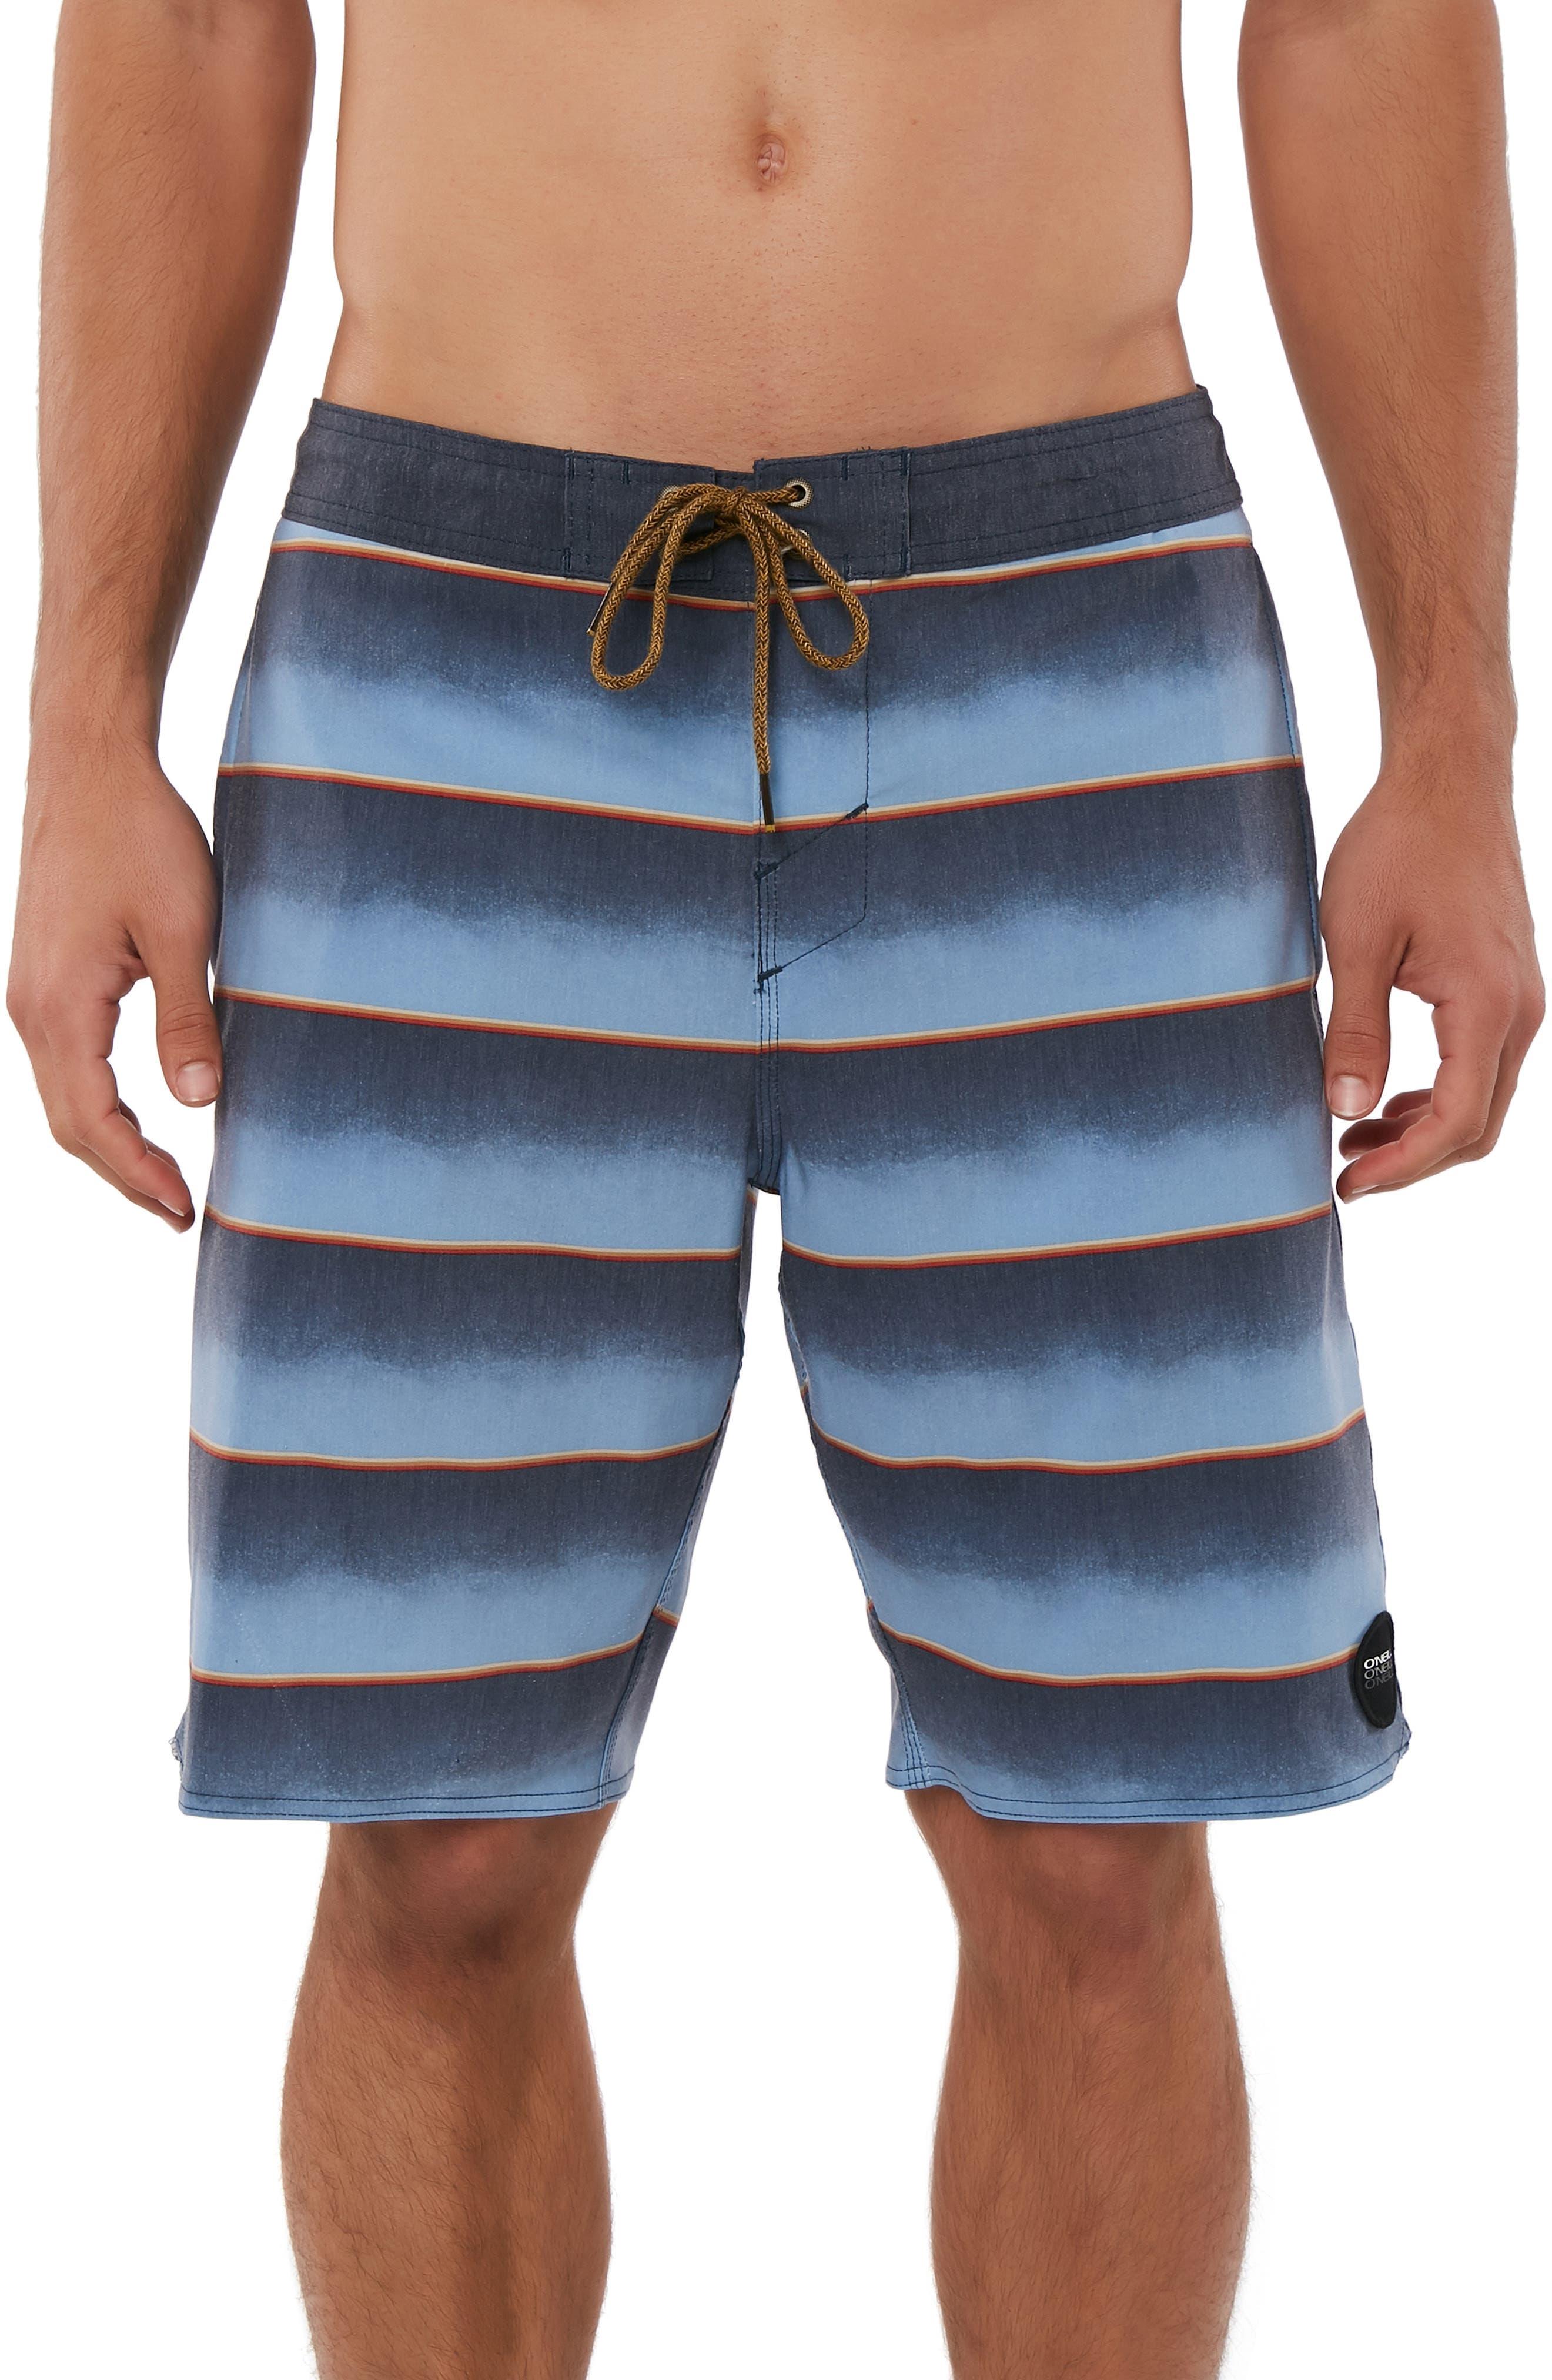 Tidelines Cruzer Board Shorts,                         Main,                         color, NAVY